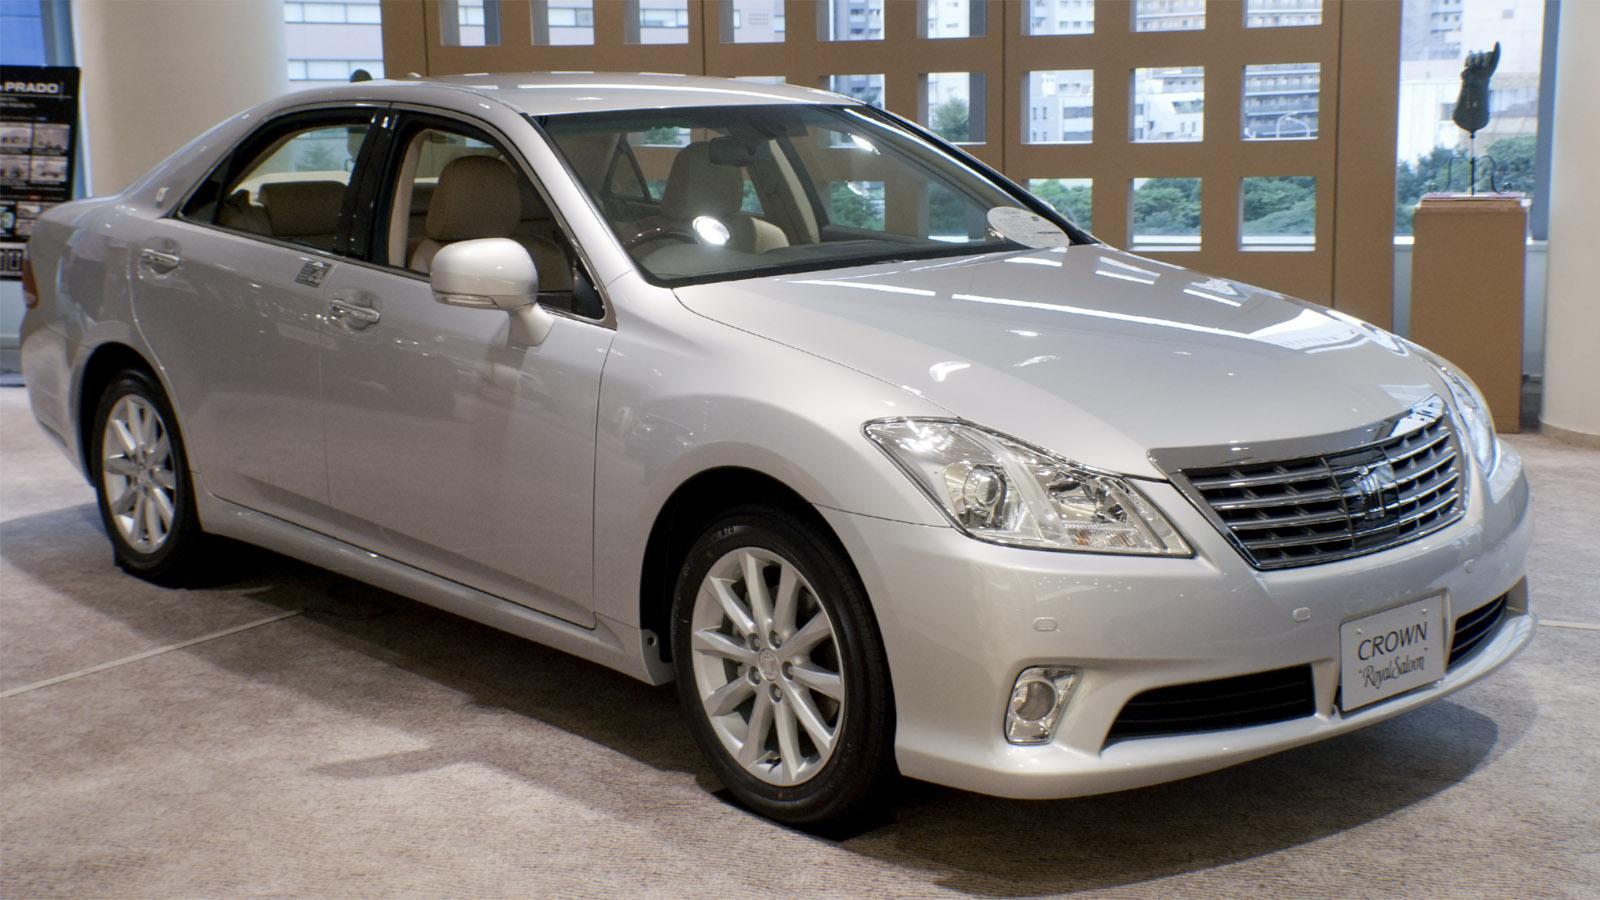 2003 Toyota Crown Royal 3.0 4WD Datenblatt - Technische ...